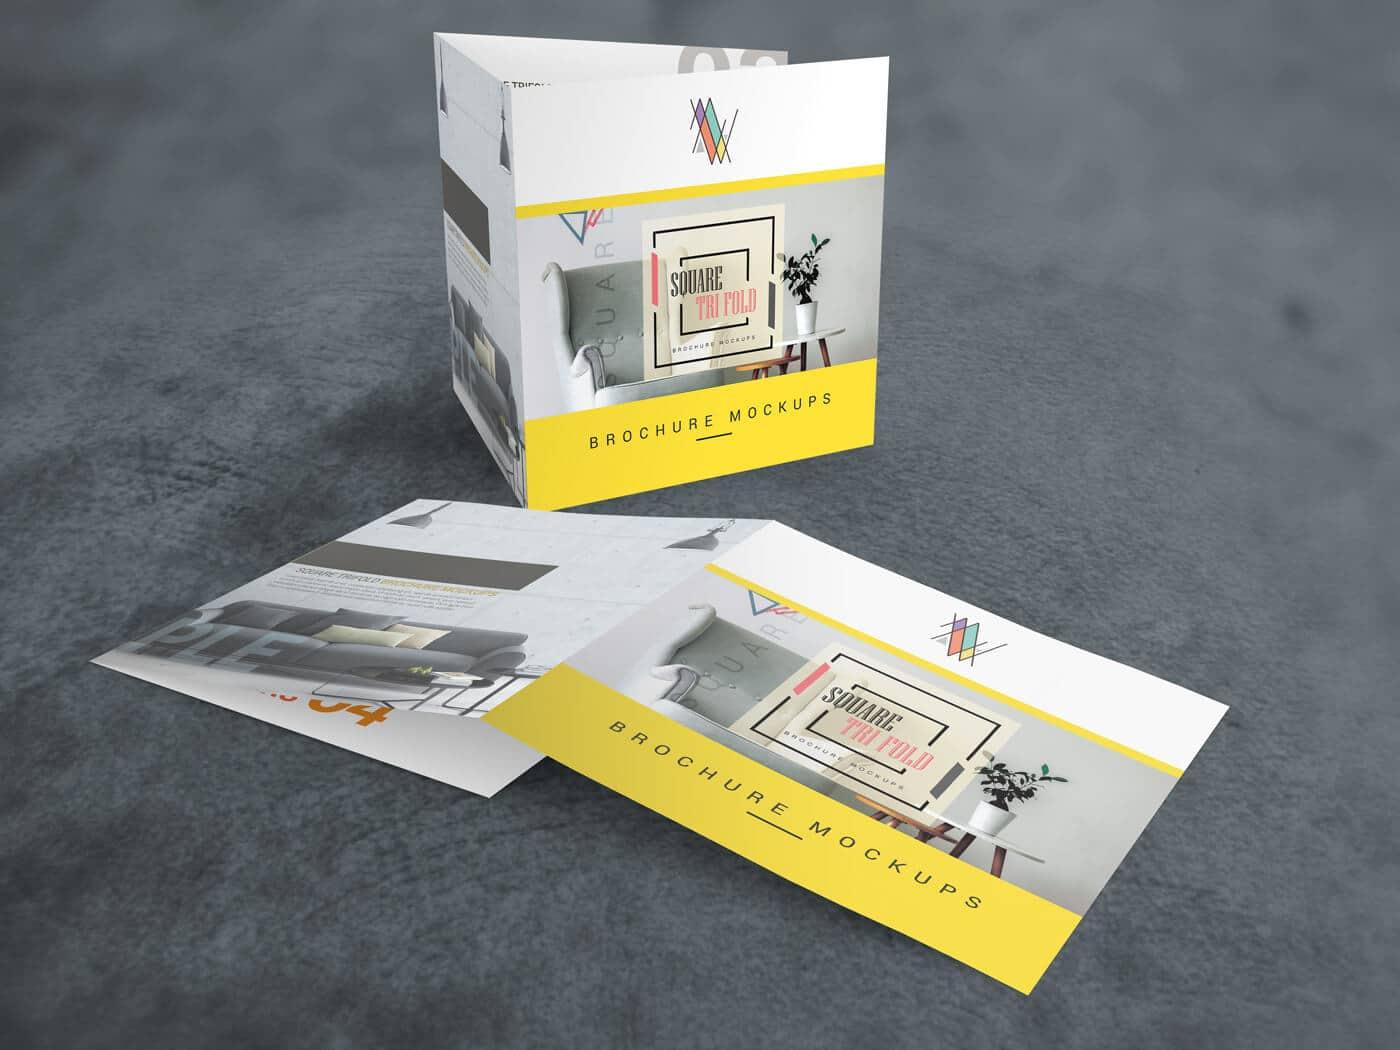 Square Trifold Brochure Mockups